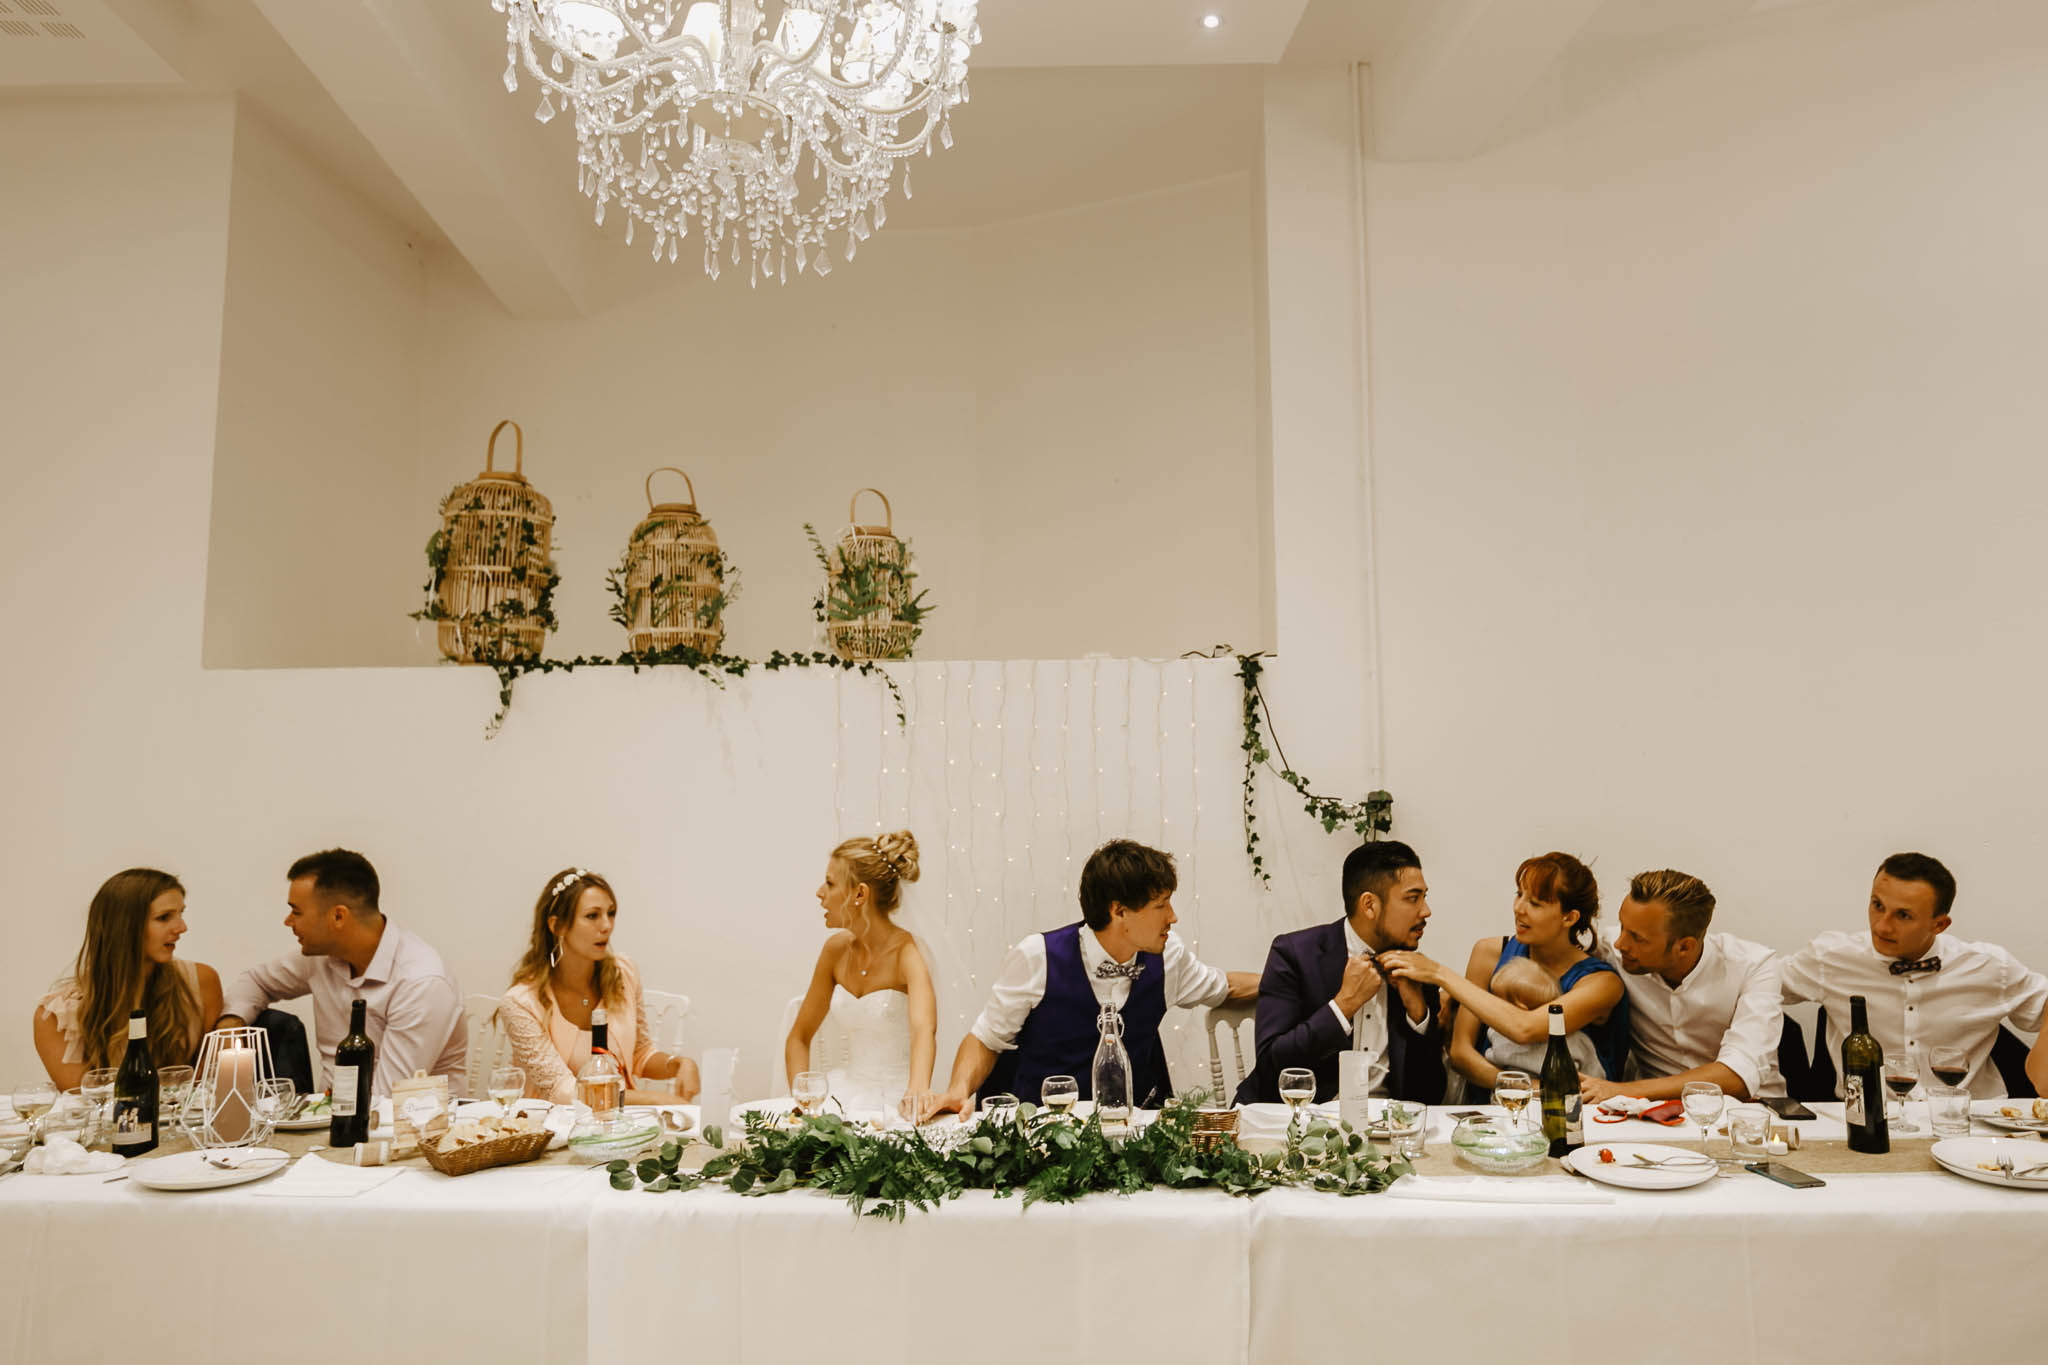 mariage-chateau-gaudras-ingold-102.jpg